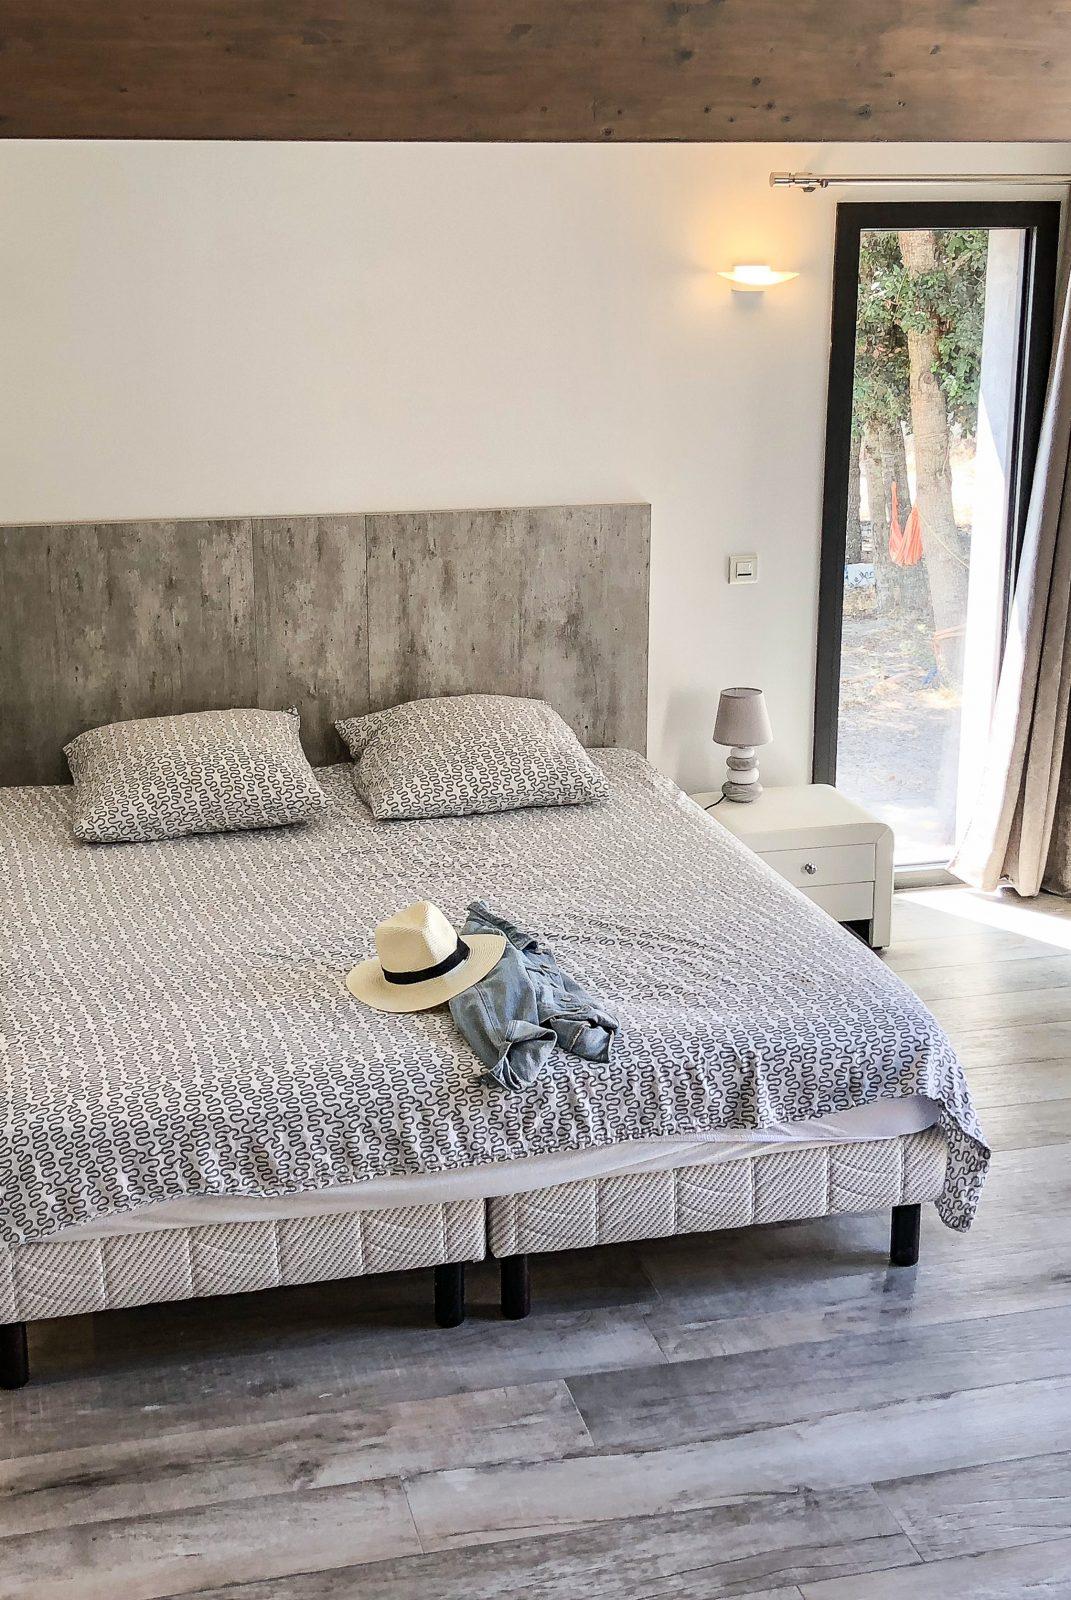 FMR_travelblog-Weekend Bonifacio-Voyage Corse-Airbnb